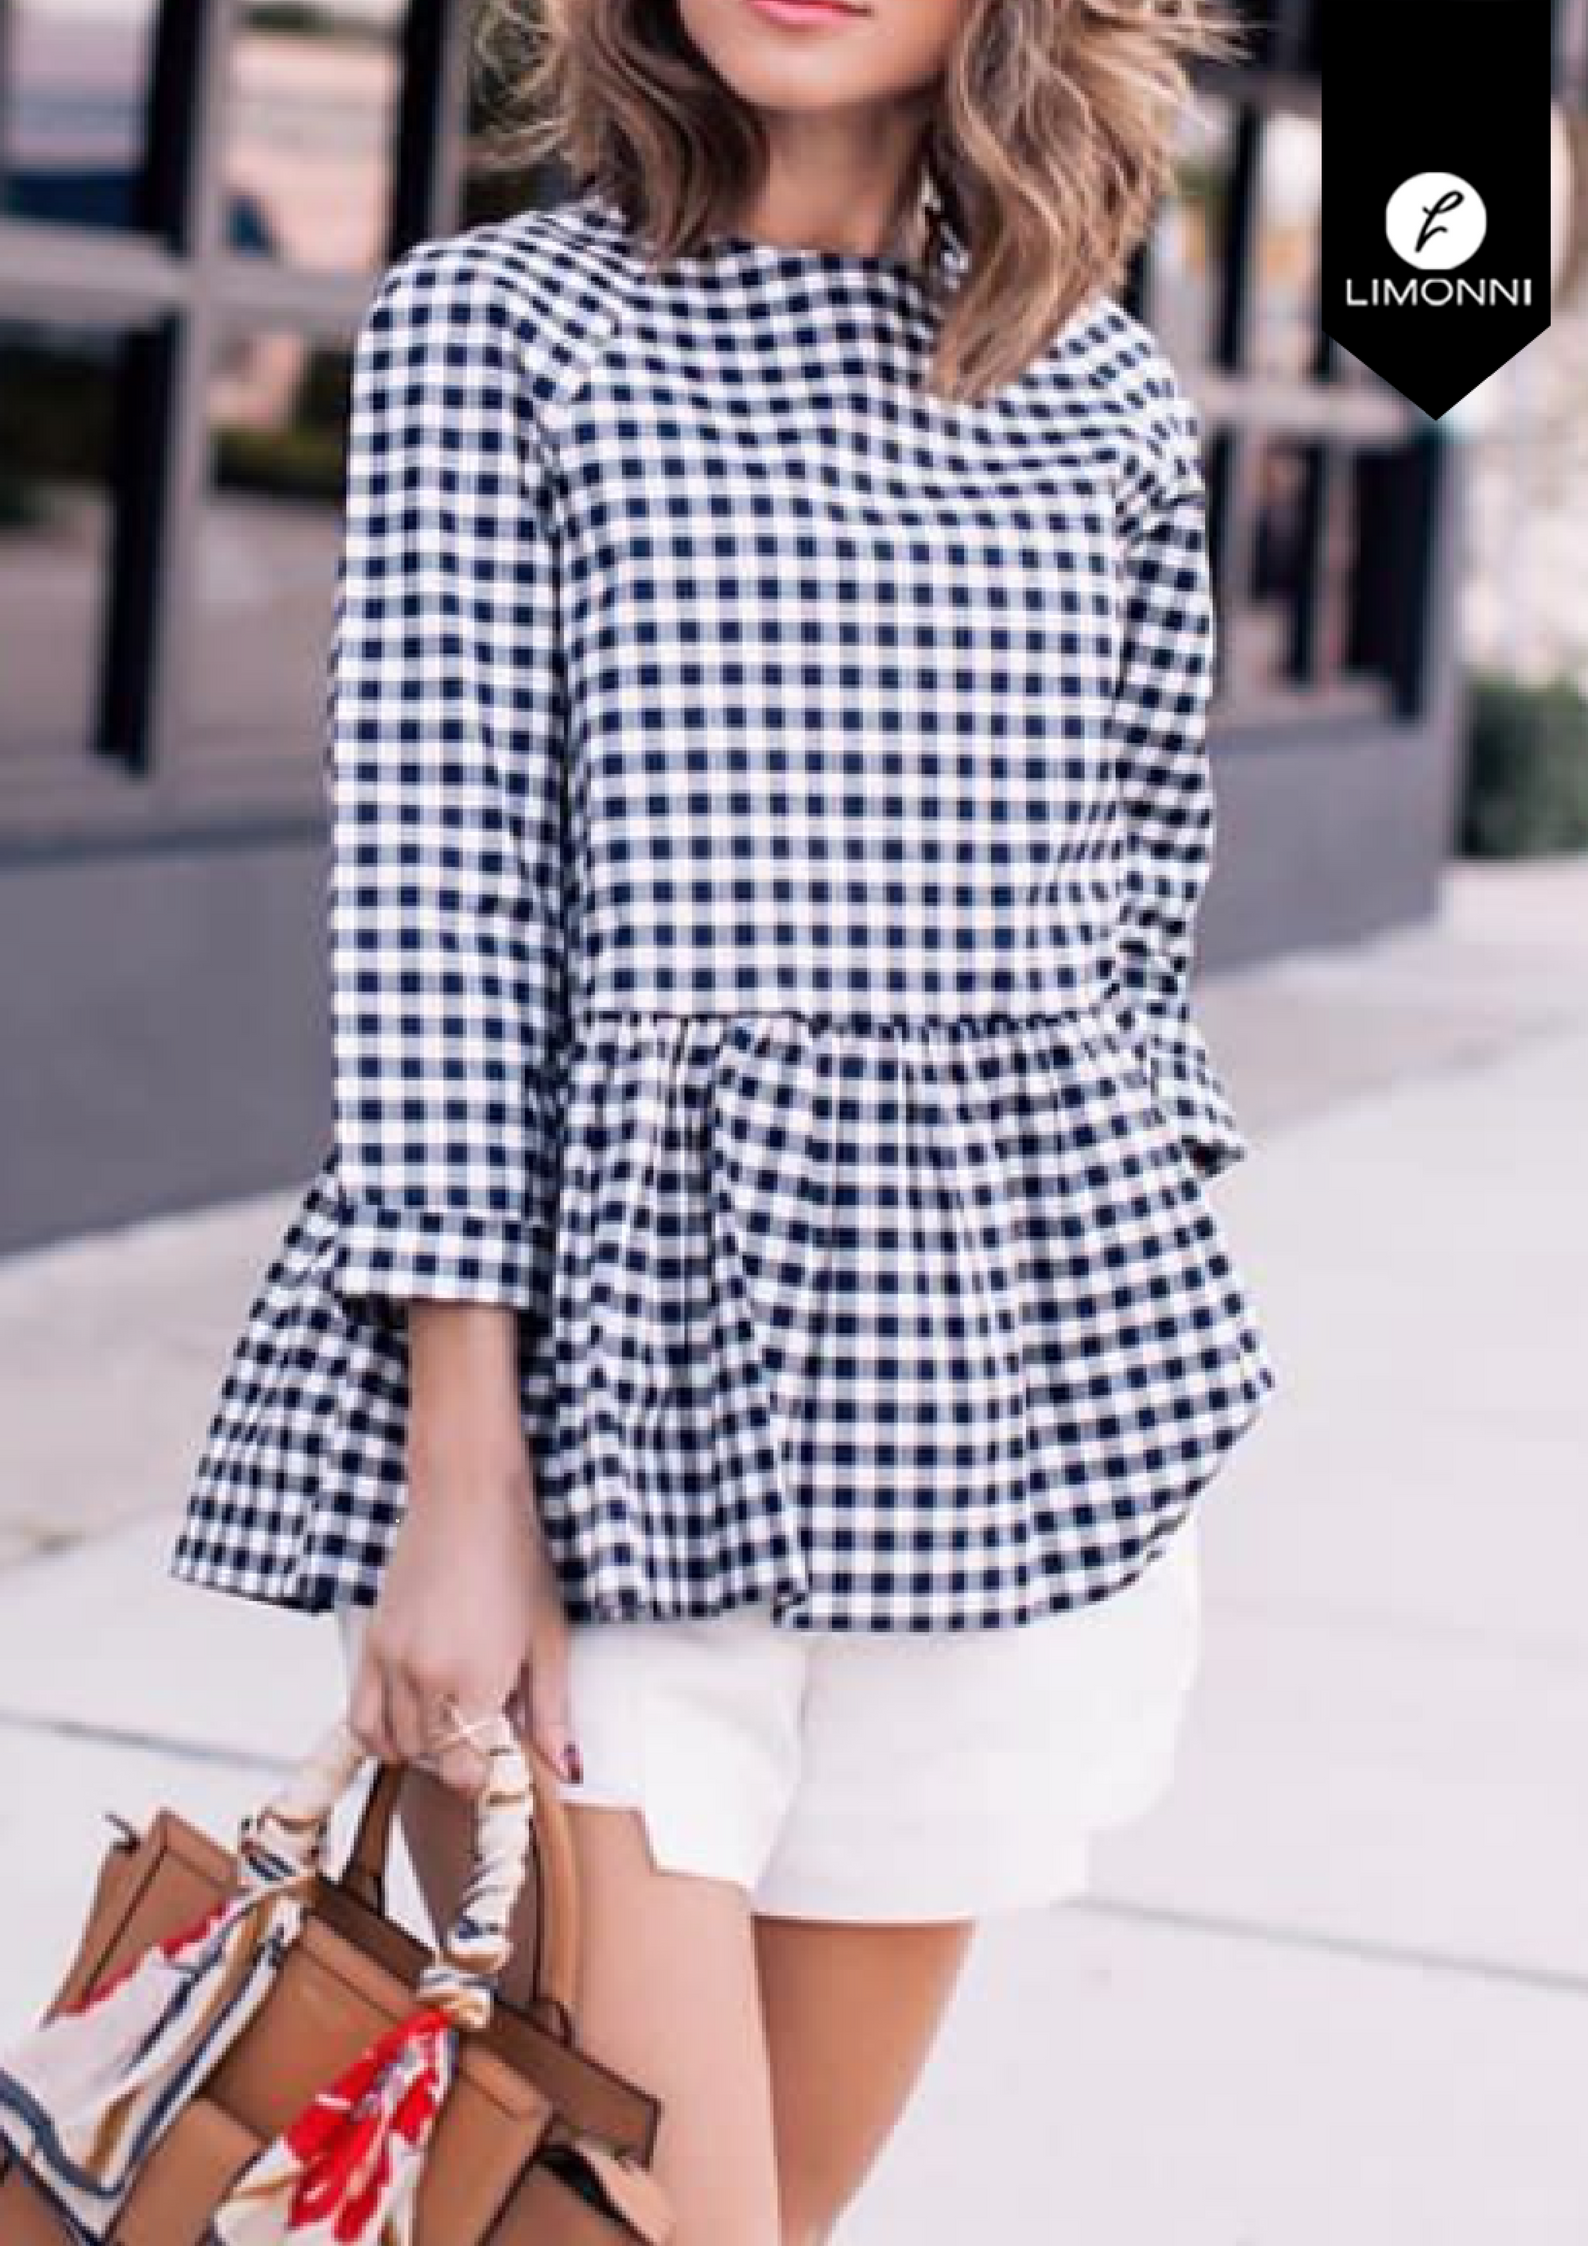 Blusas para mujer Limonni Bennett LI1327 Casuales